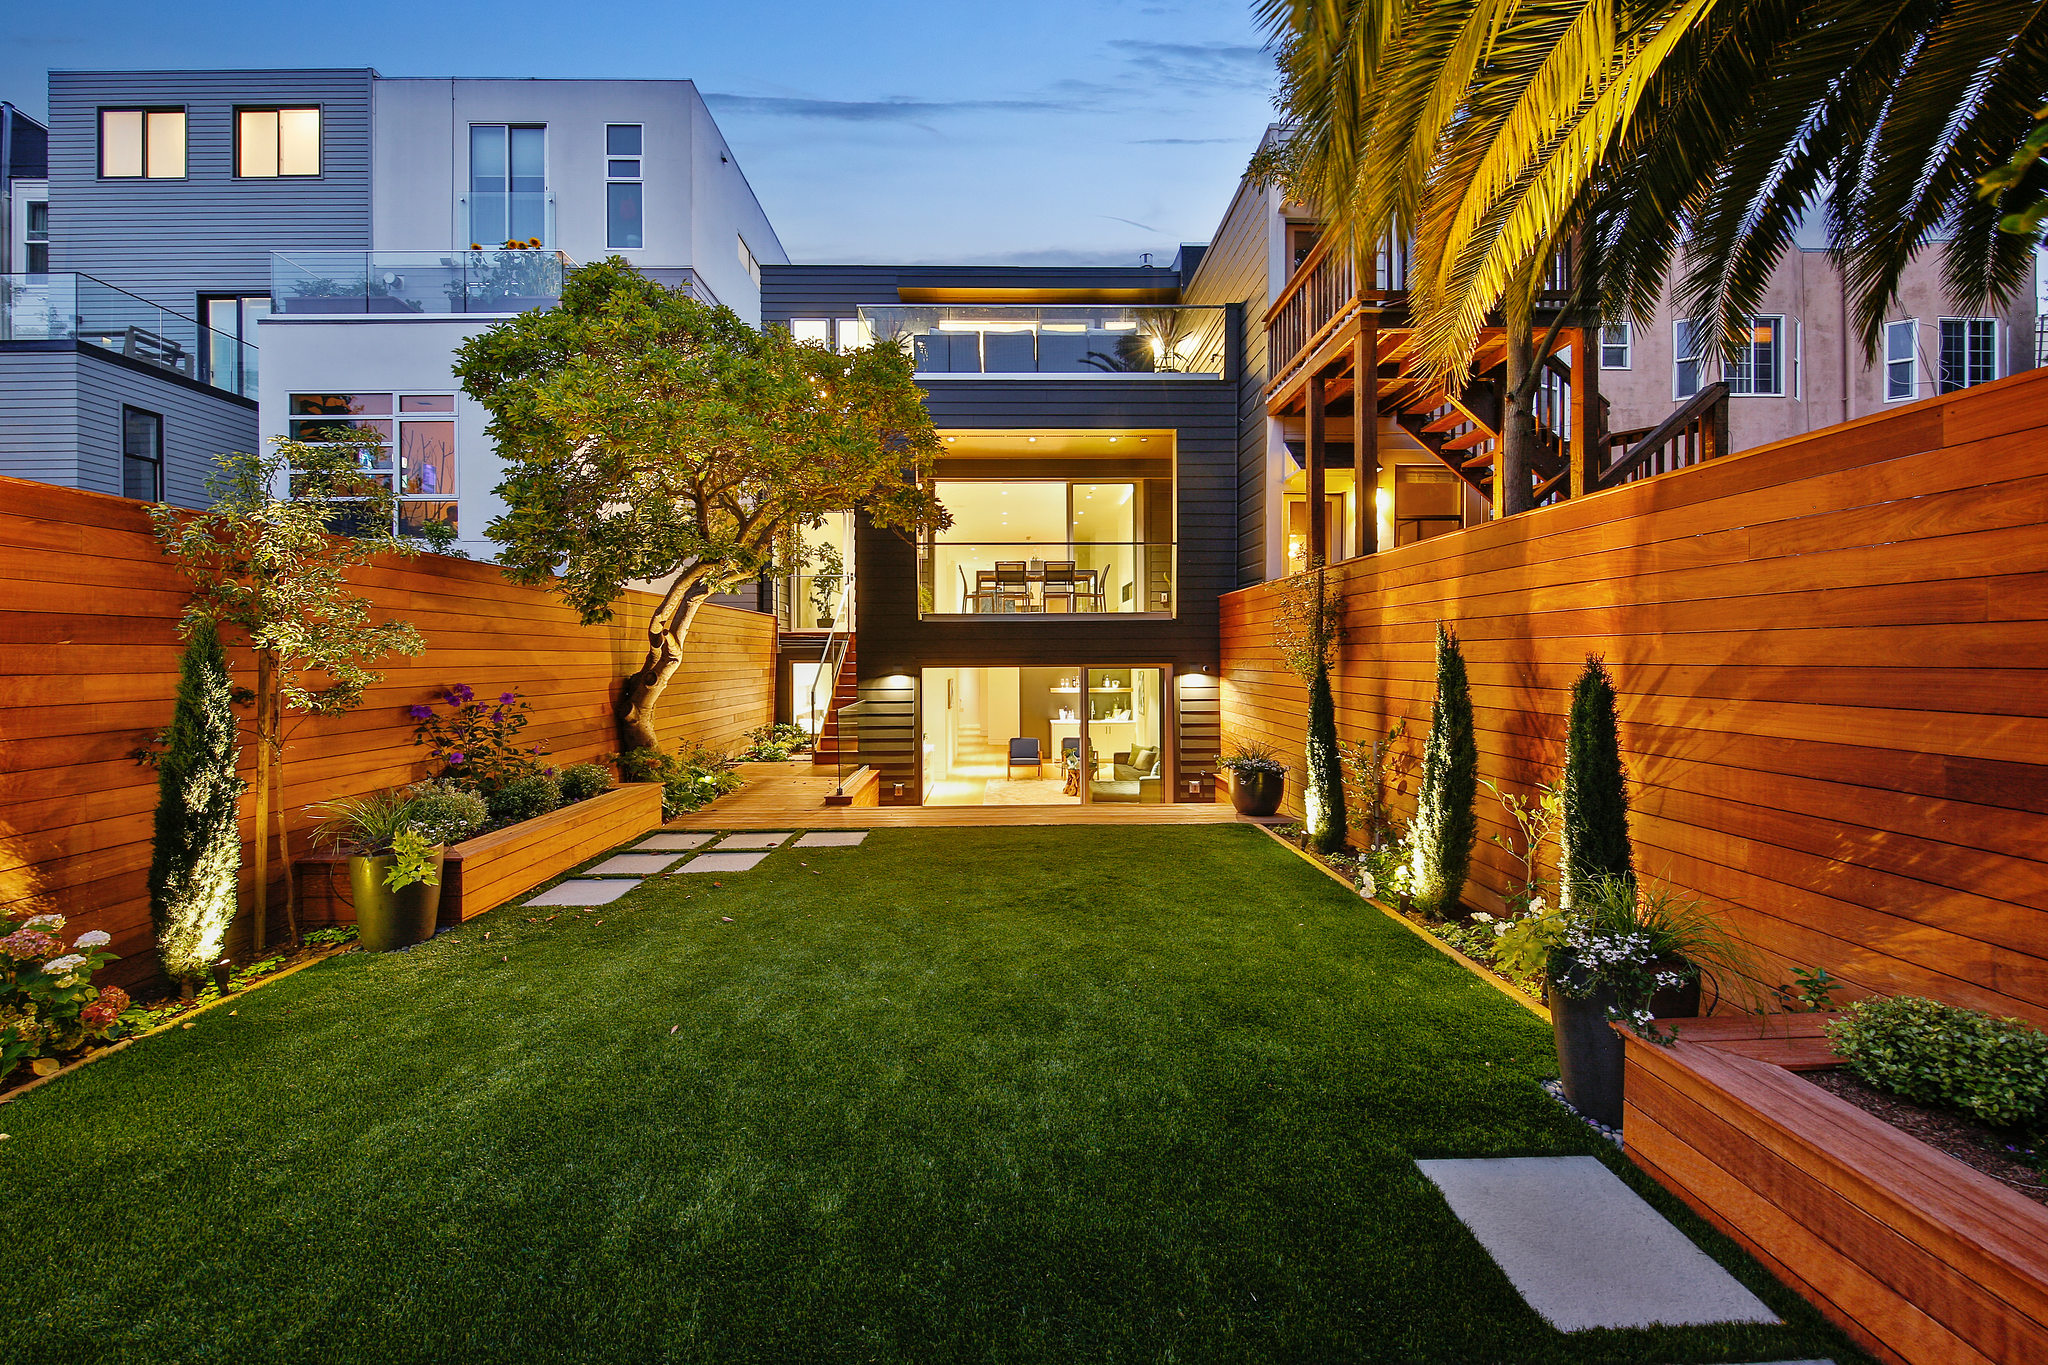 The Magnolia House Noe Valley, $5.6M